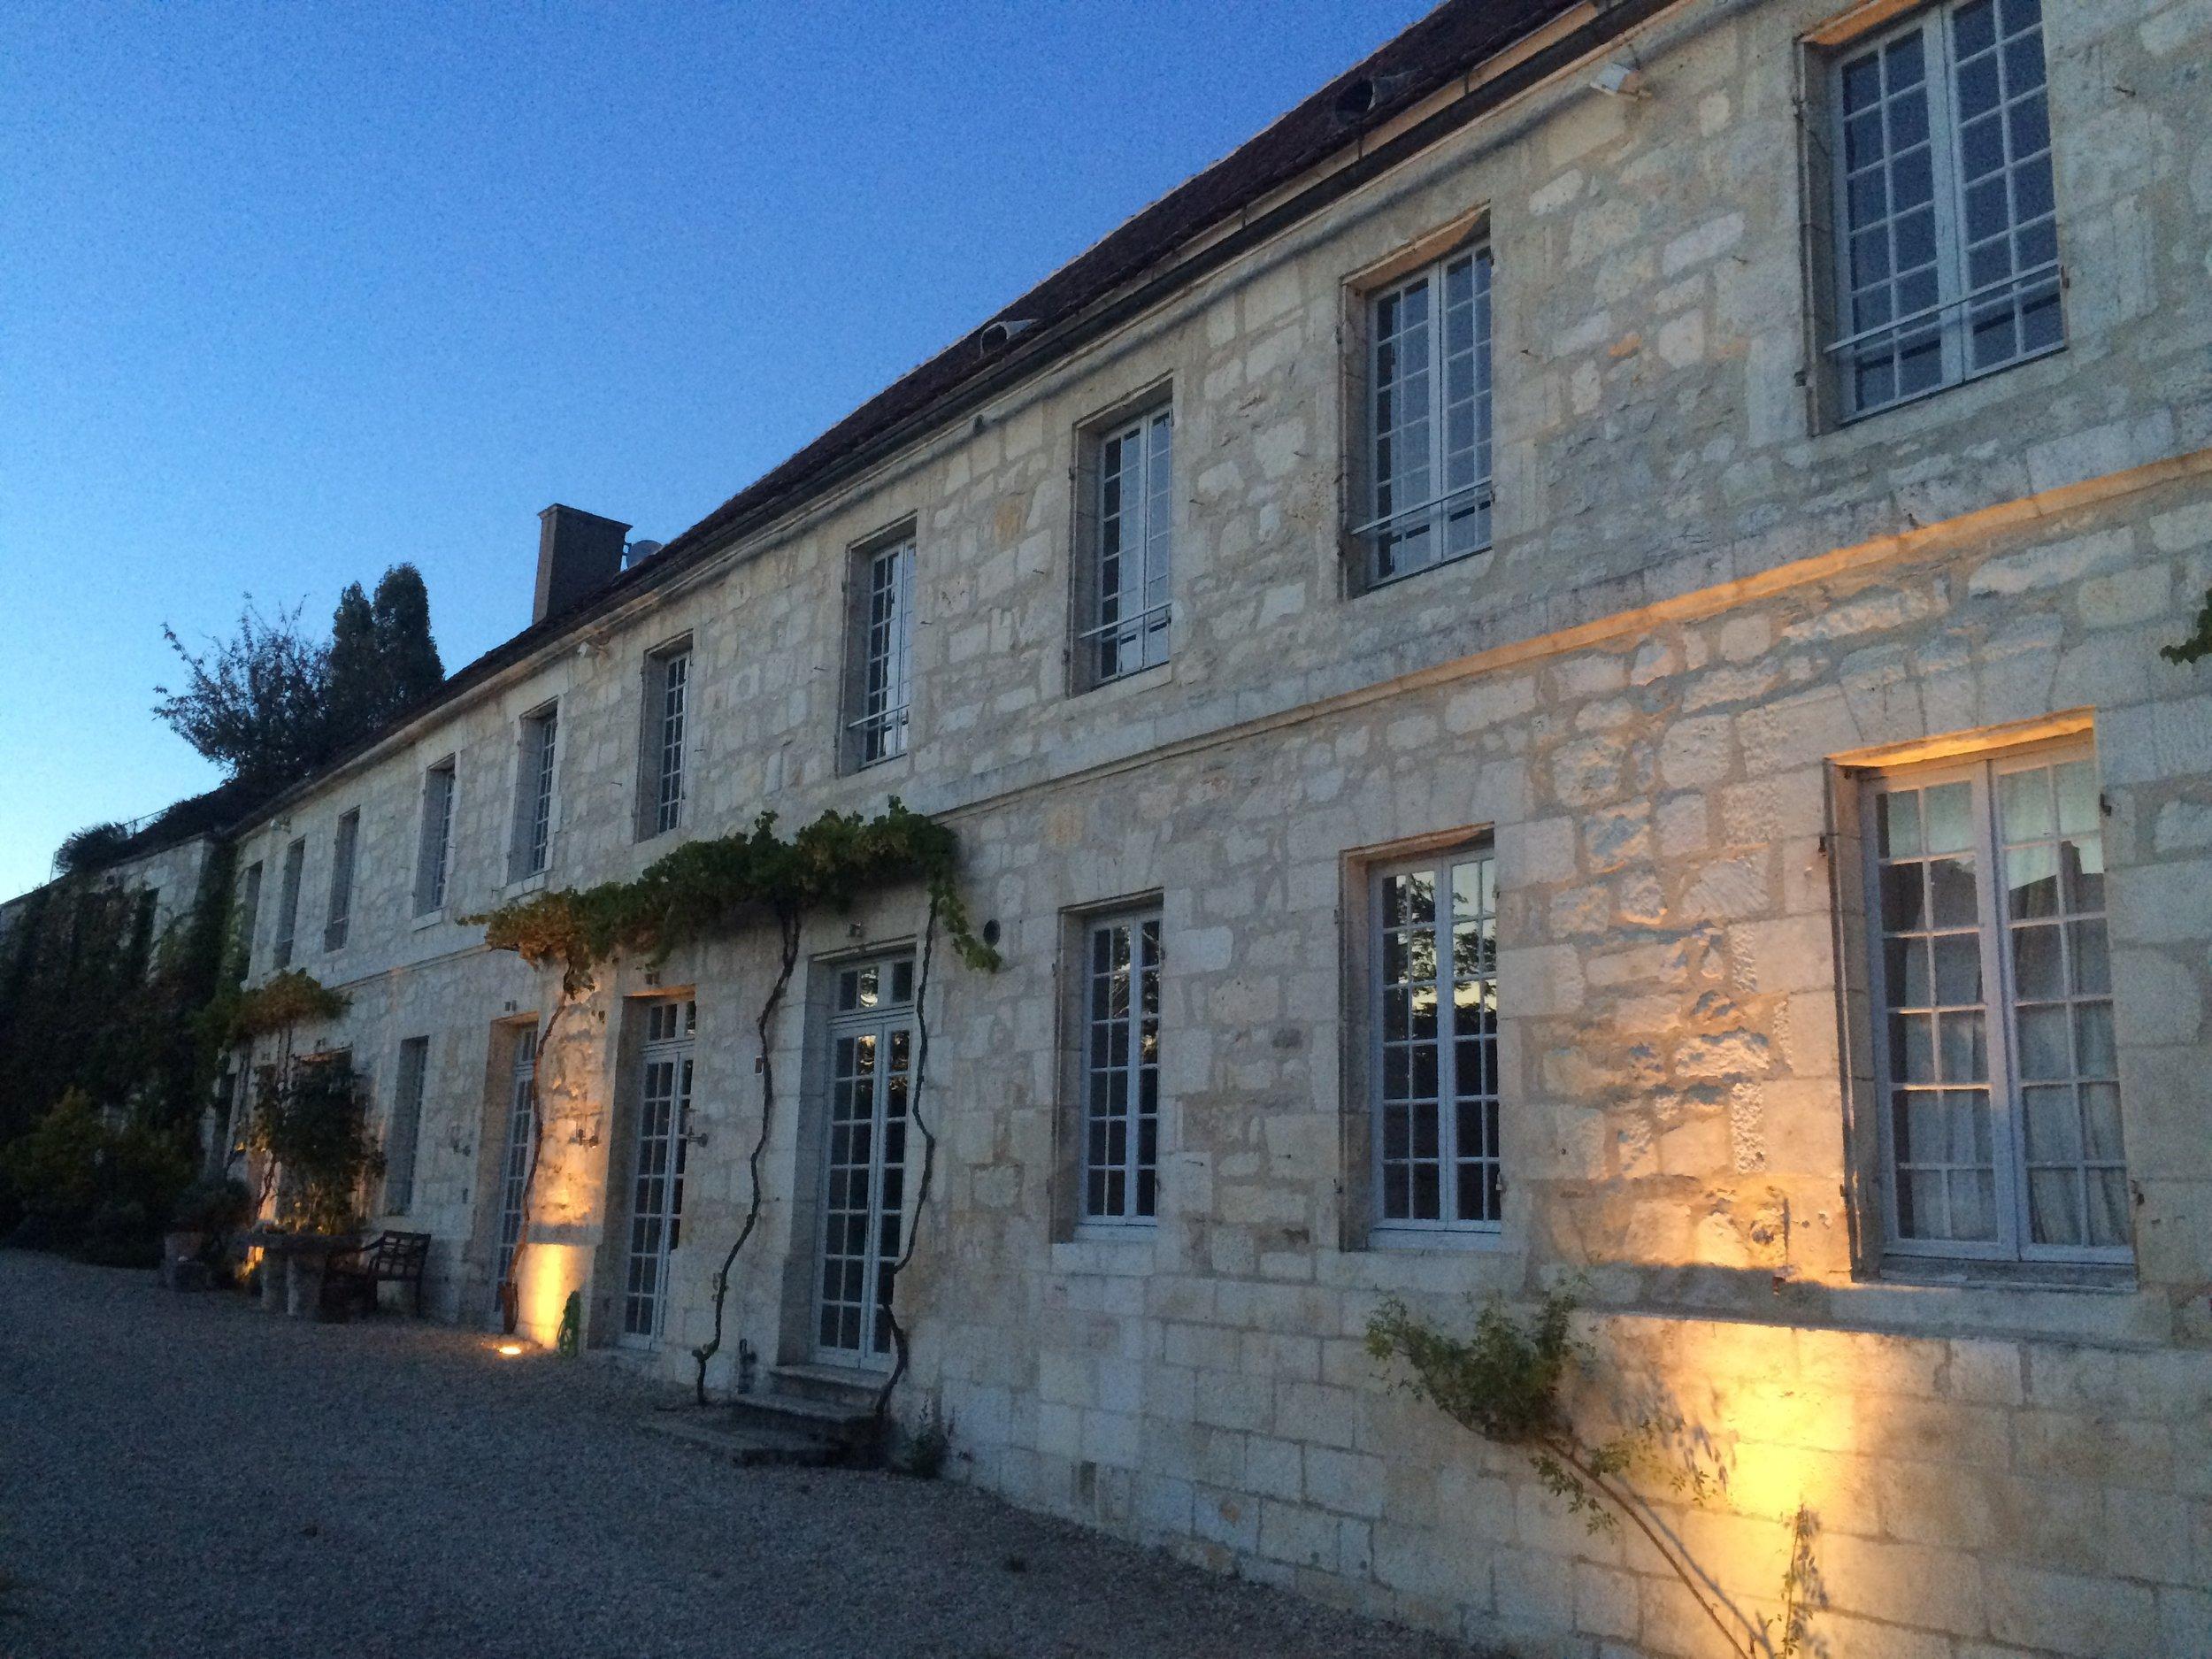 Chateau_Commons_Dusk.jpg